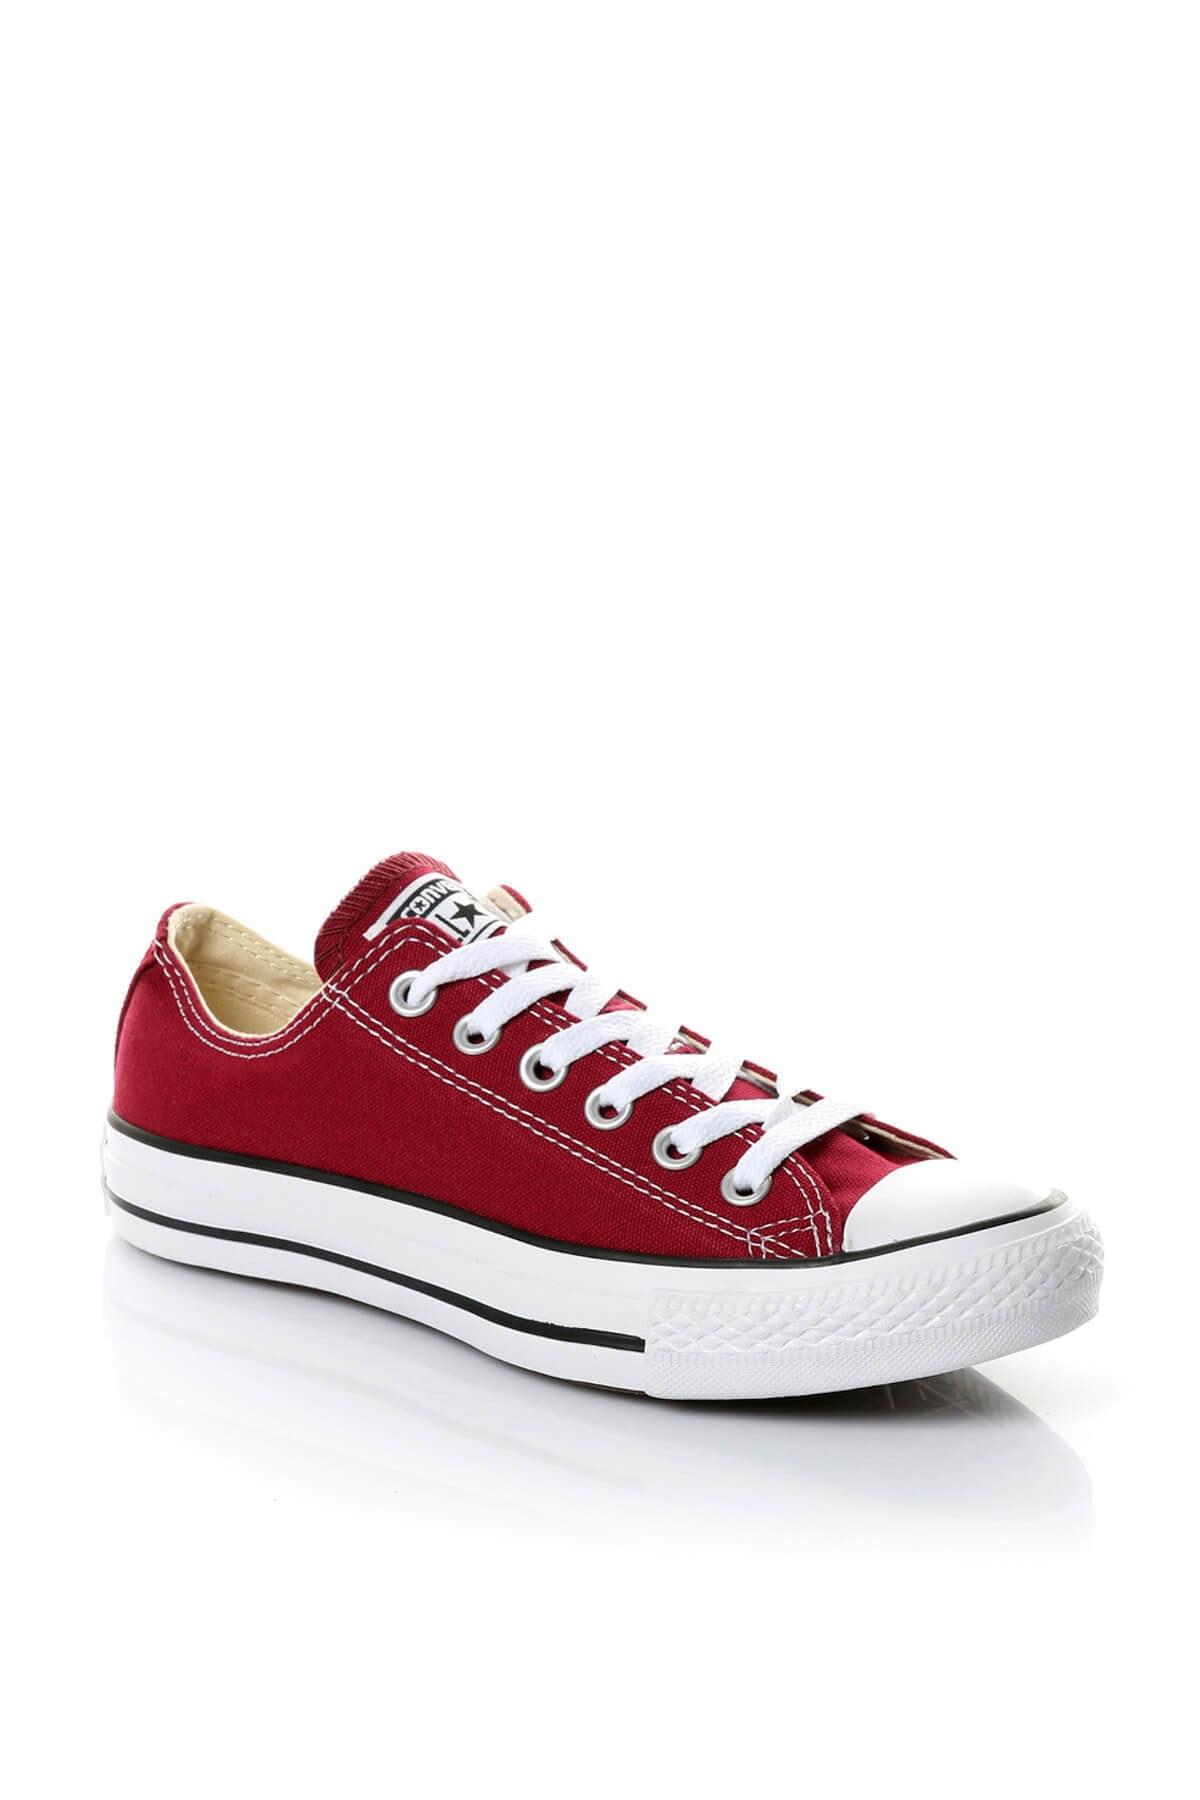 converse Chuck Taylor All Star Seasonal Unisex Bordo Sneaker 1